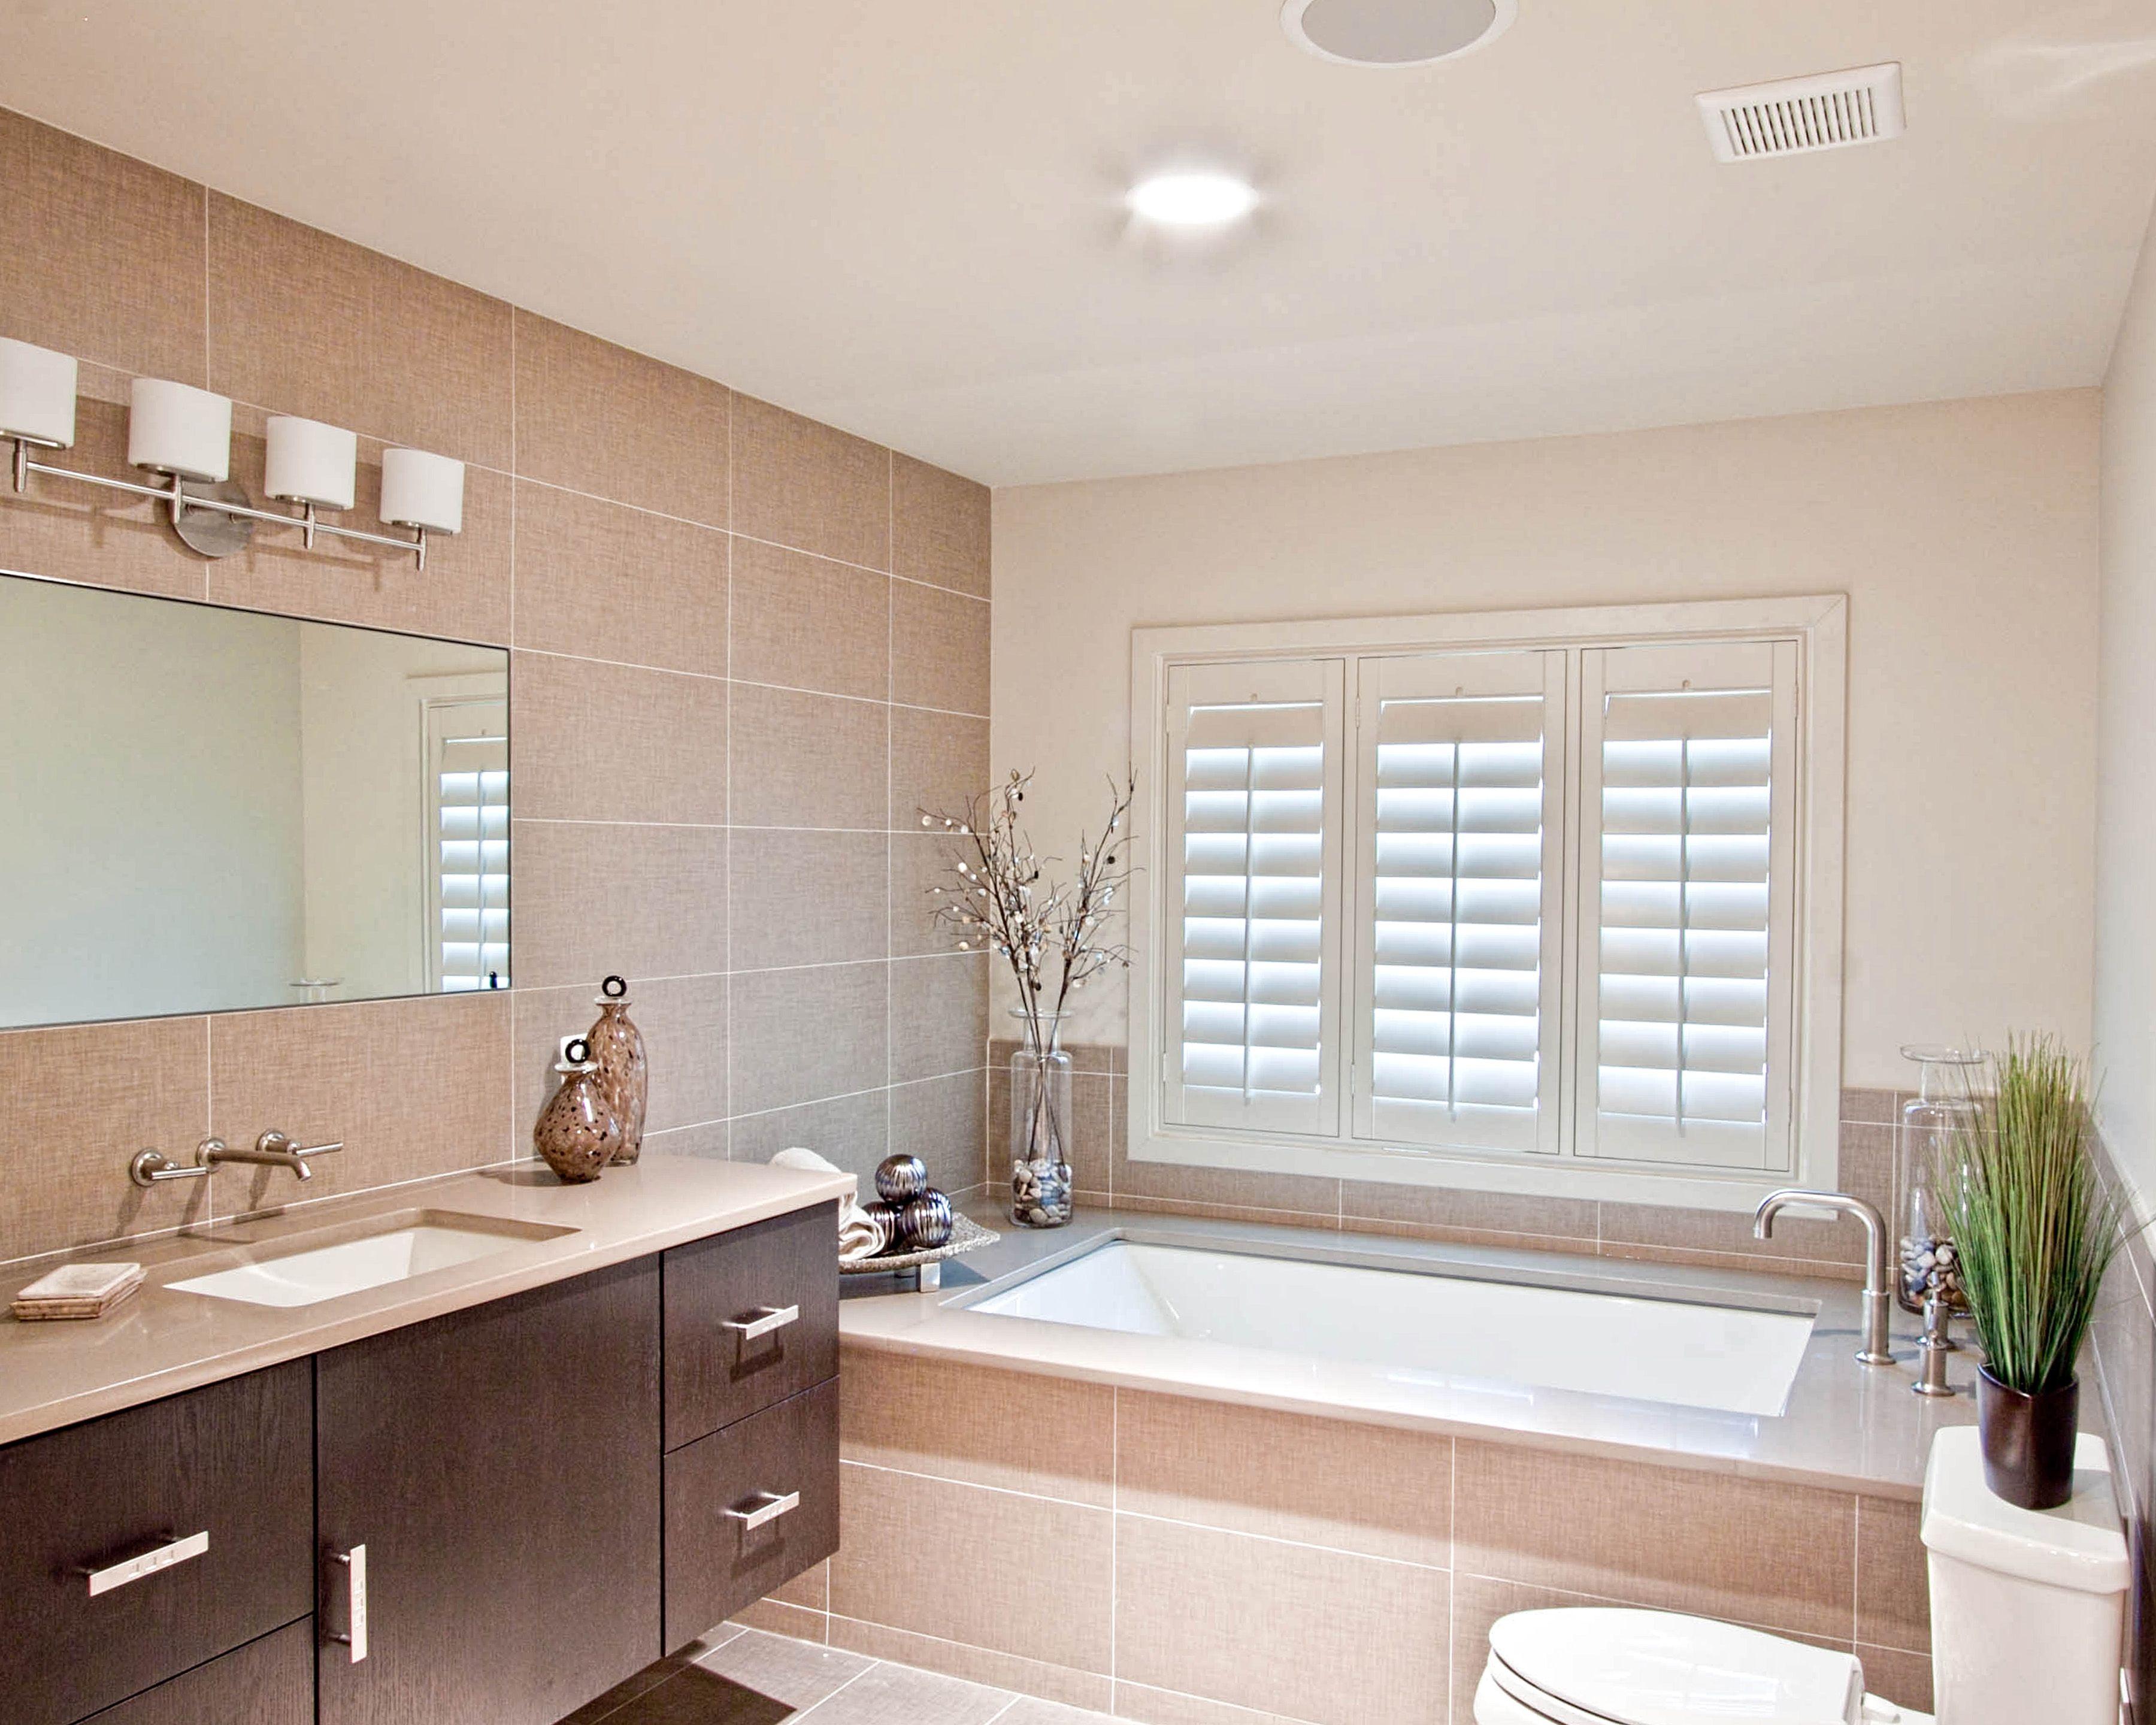 Porcelanosa Tile Kohler Wall Mounted Vanity Faucet Silestone - Kohler bathroom vanity faucets